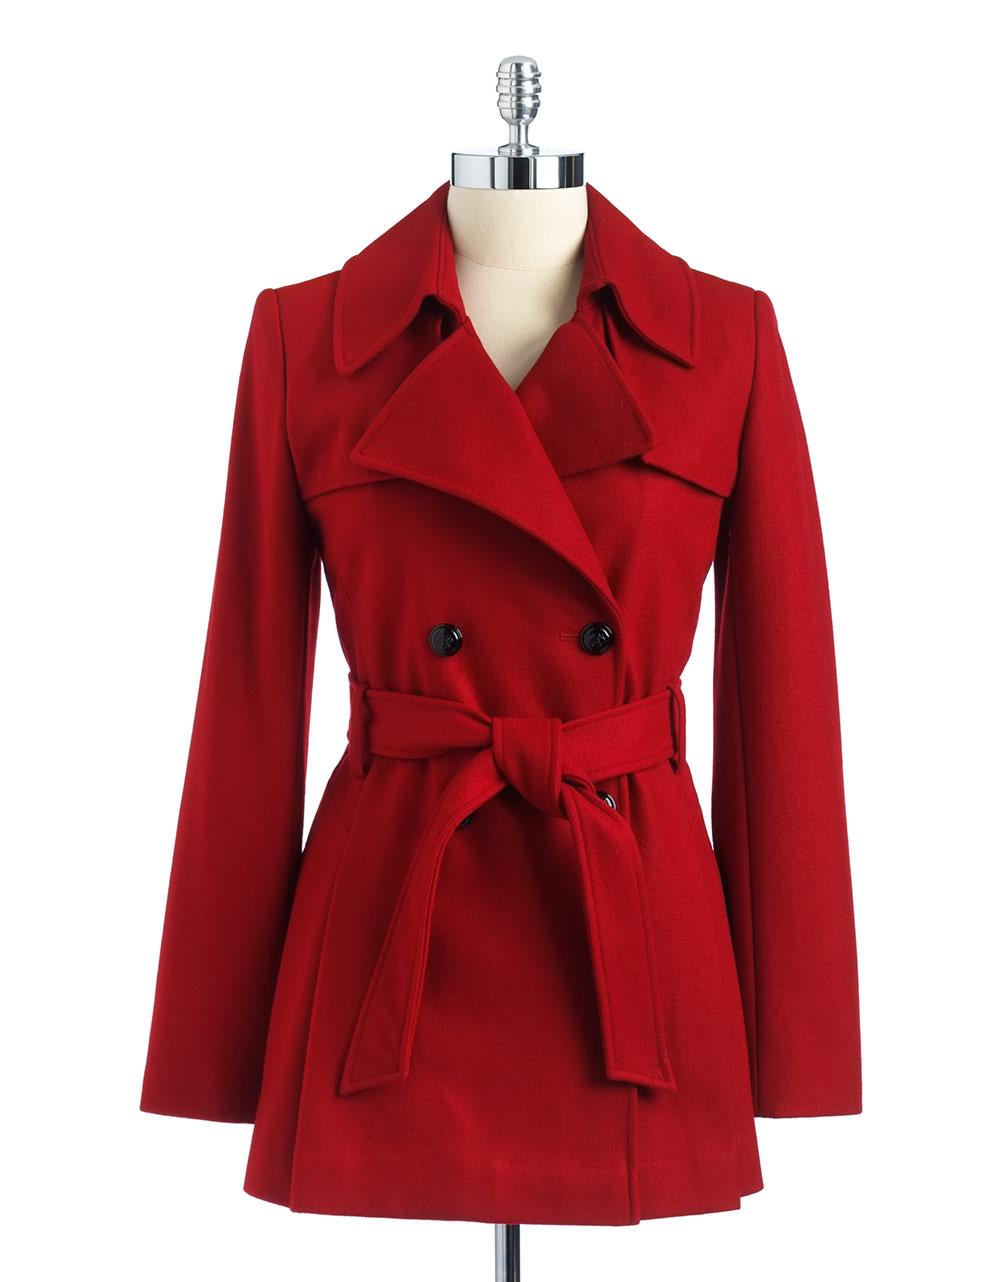 Bape Shark 578d02a199086afbd705f6b1 moreover Kis trendi oversized paltolar further Maureen Oboyle 2 additionally 3479176 additionally 52605c6f20b85f4281005b25. on michael kors coats for